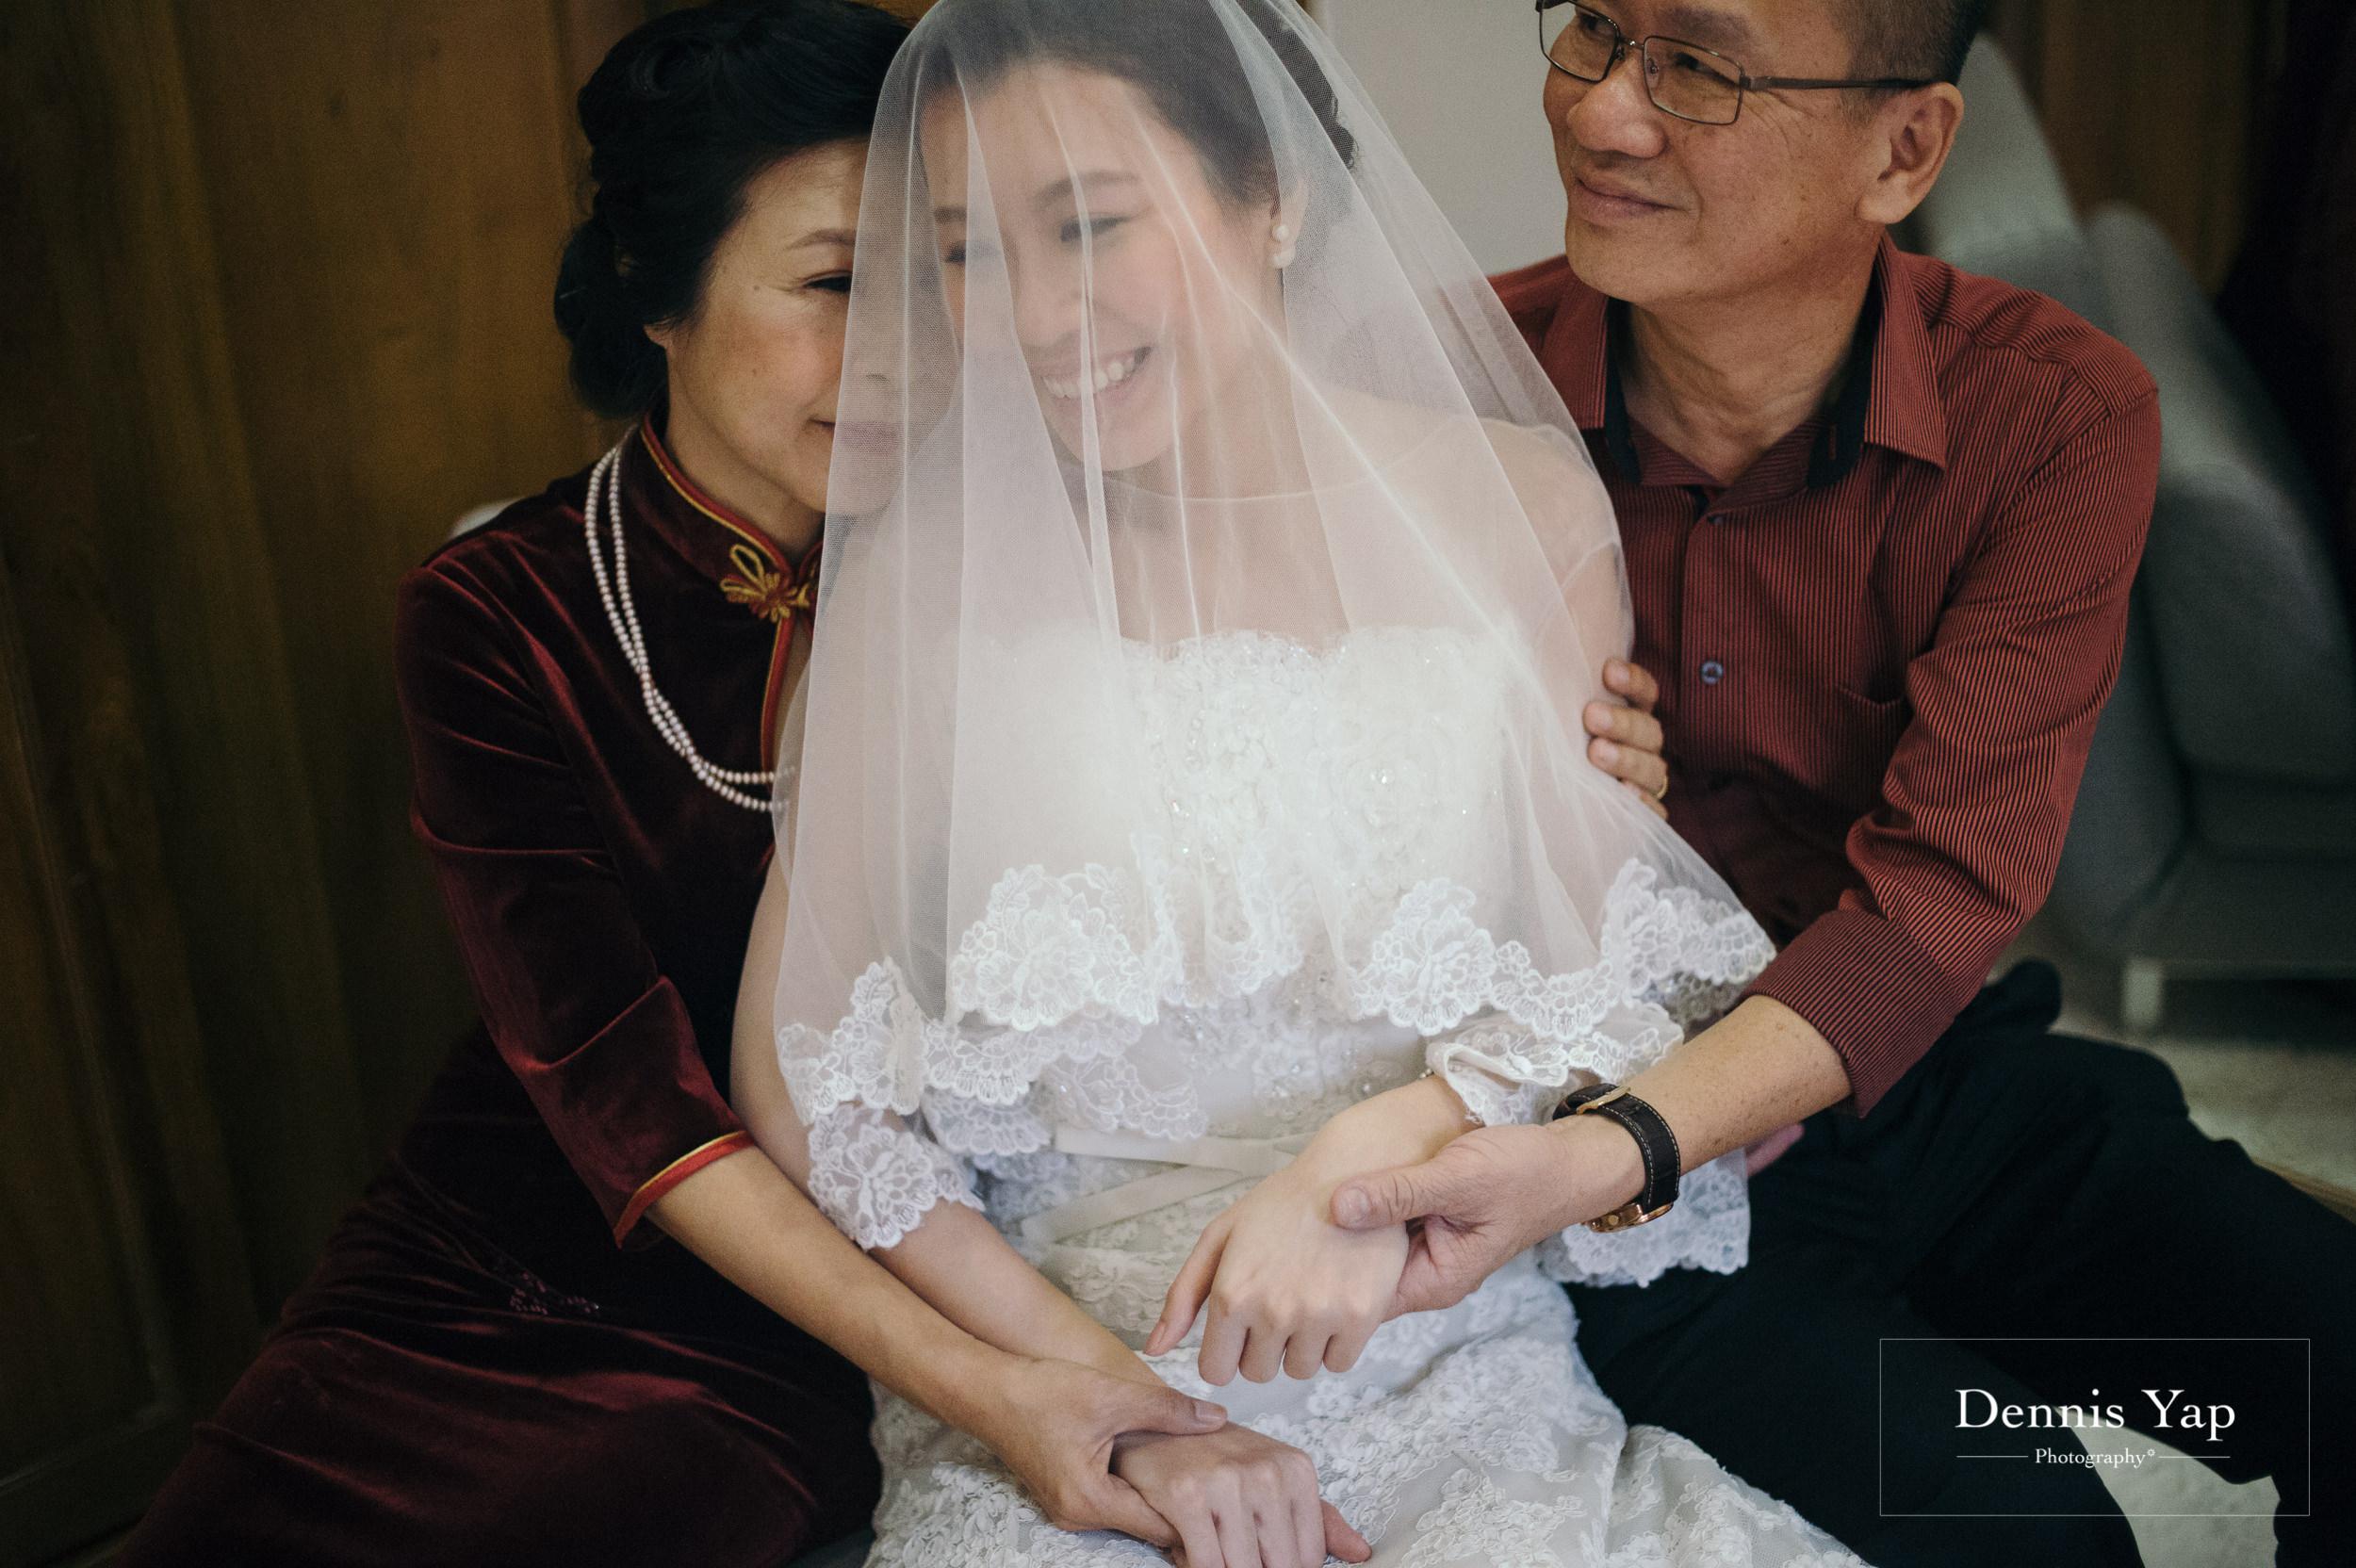 danny sherine wedding day group photo dennis yap photography usj heights malaysia top wedding photographer-3.jpg